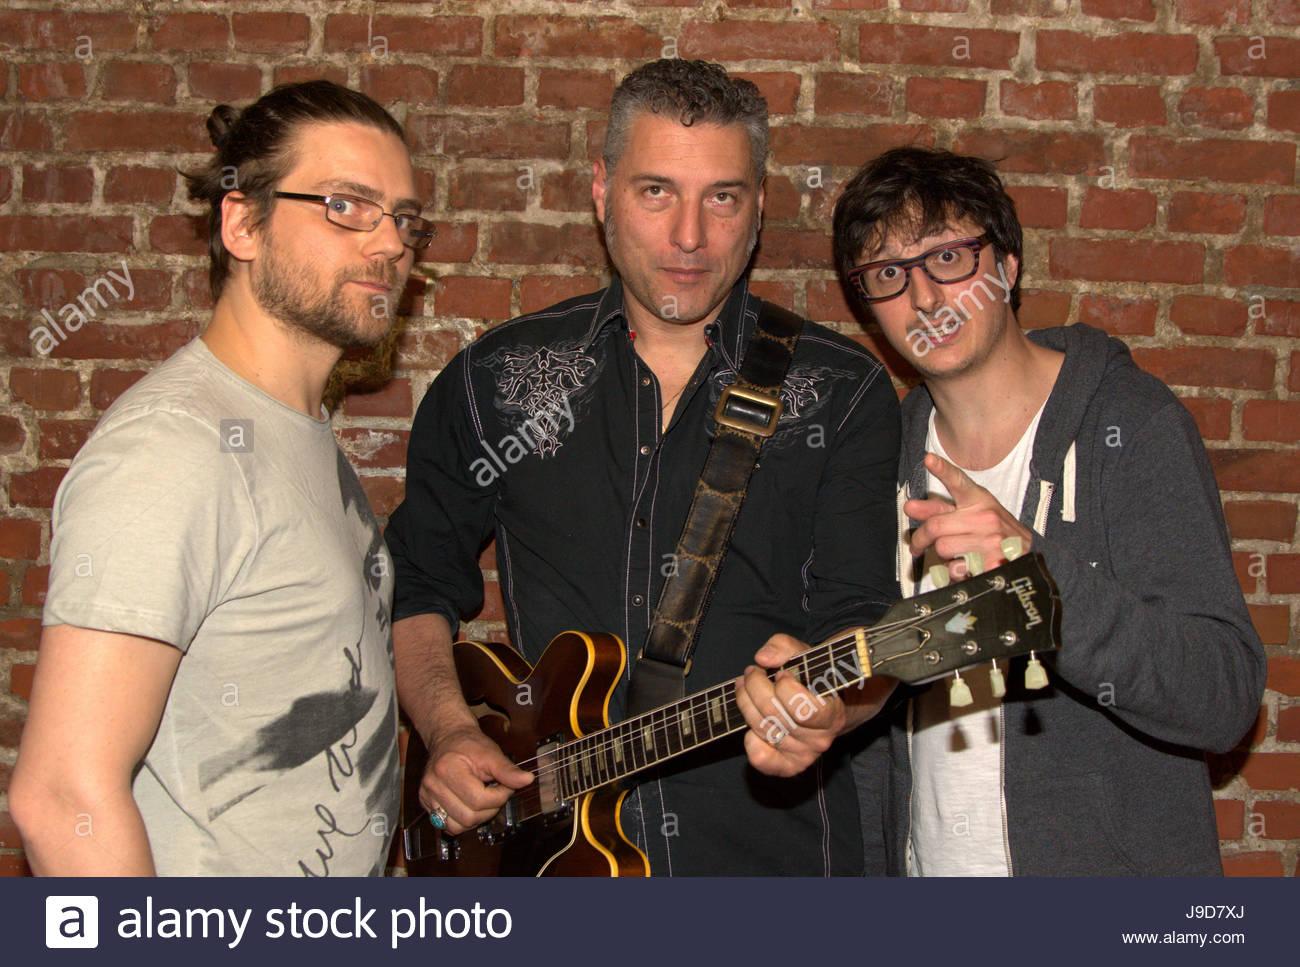 Die italienische Bluesband Morblus: Stefano Dallaporta (Bass), Roberto Morbioli (Gitarre und Gesang), Nik Taccori - Stock Image